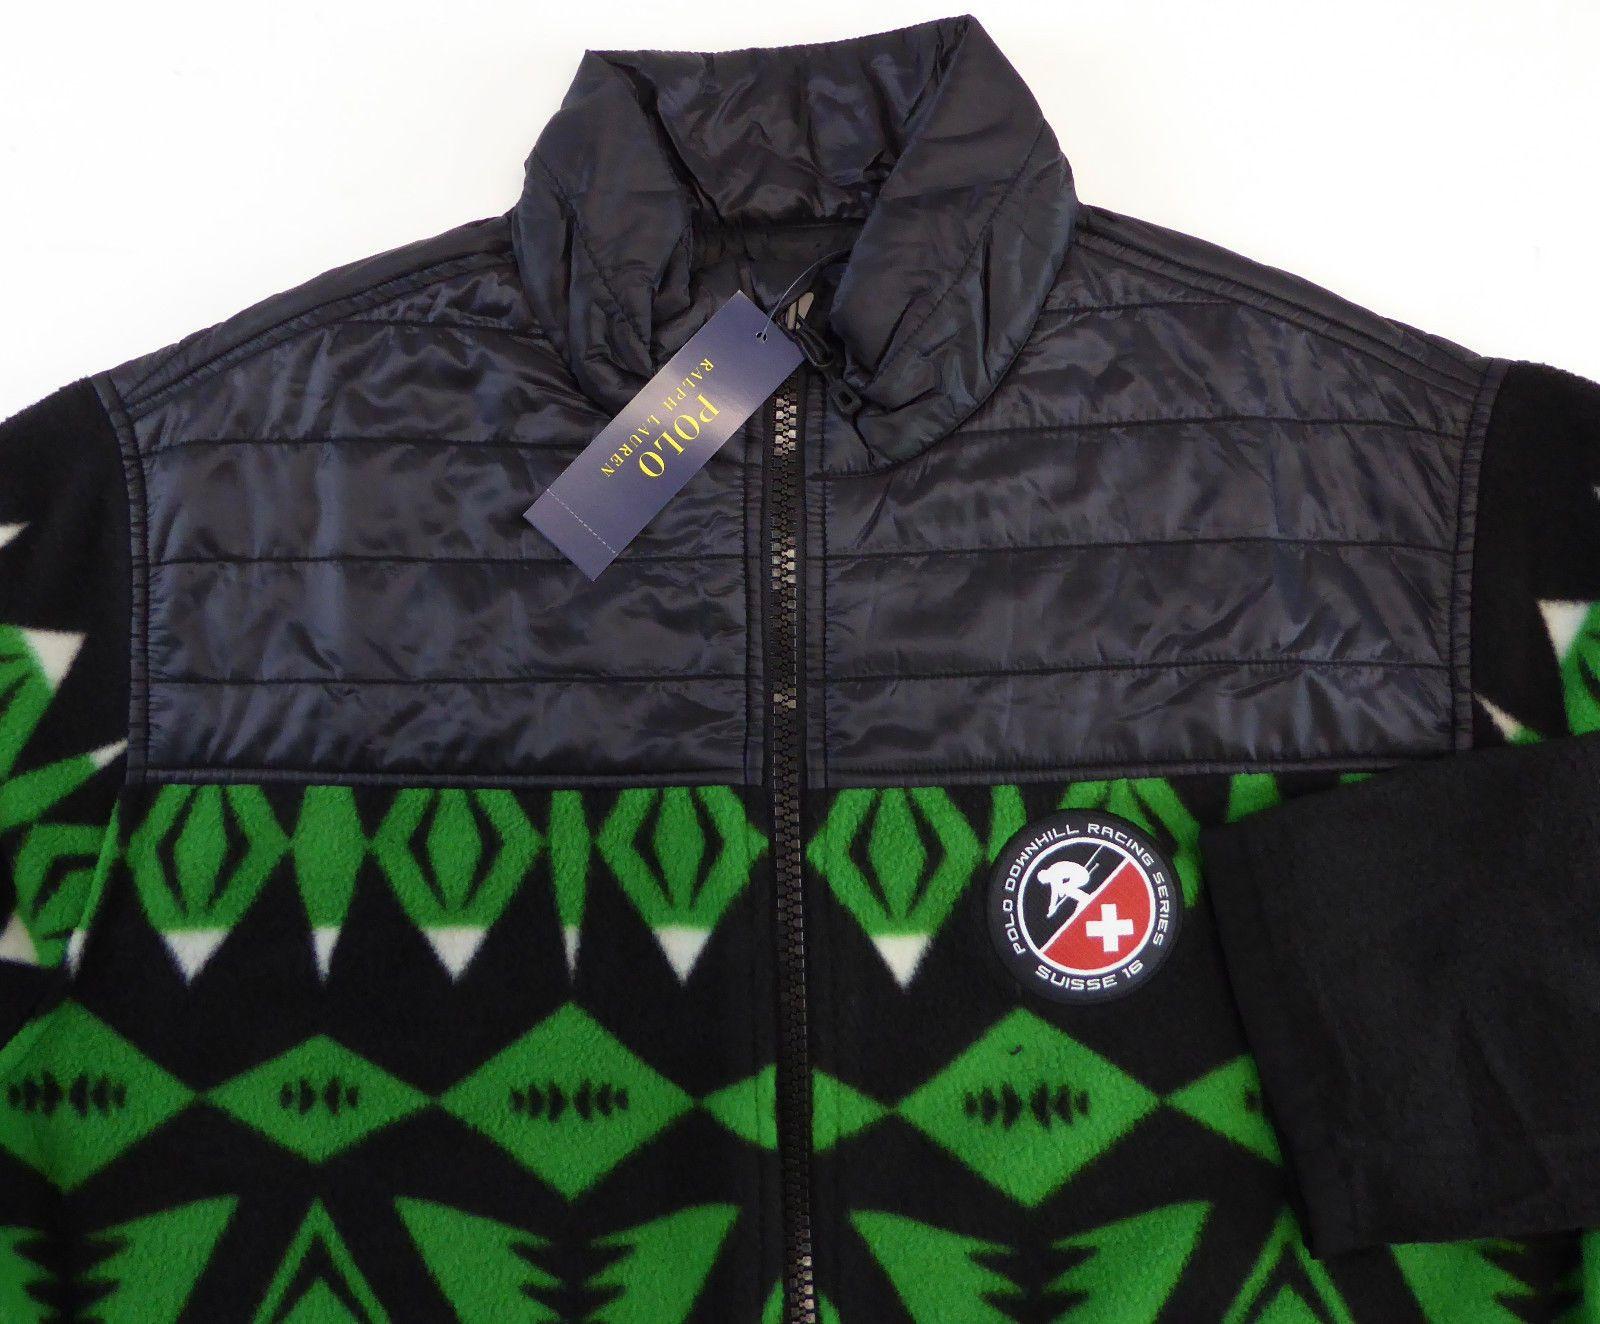 Downhill skiing nordic suisse fleece jacket menus outerwear